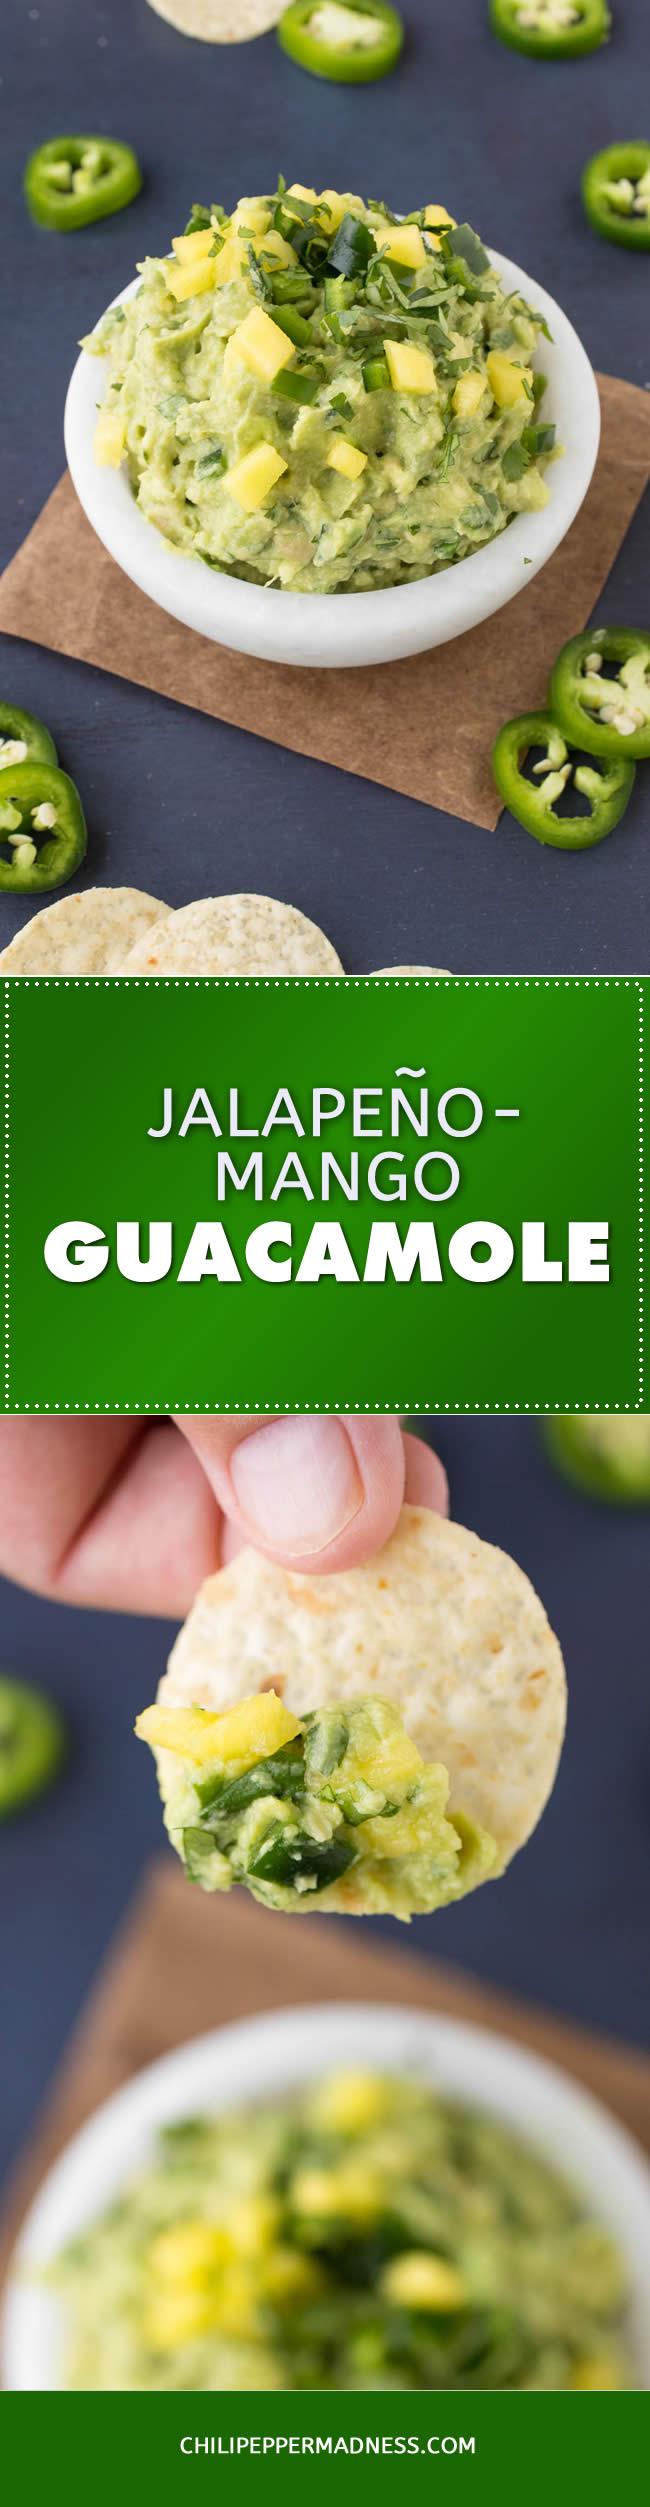 Jalapeno-Mango Guacamole - Recipe